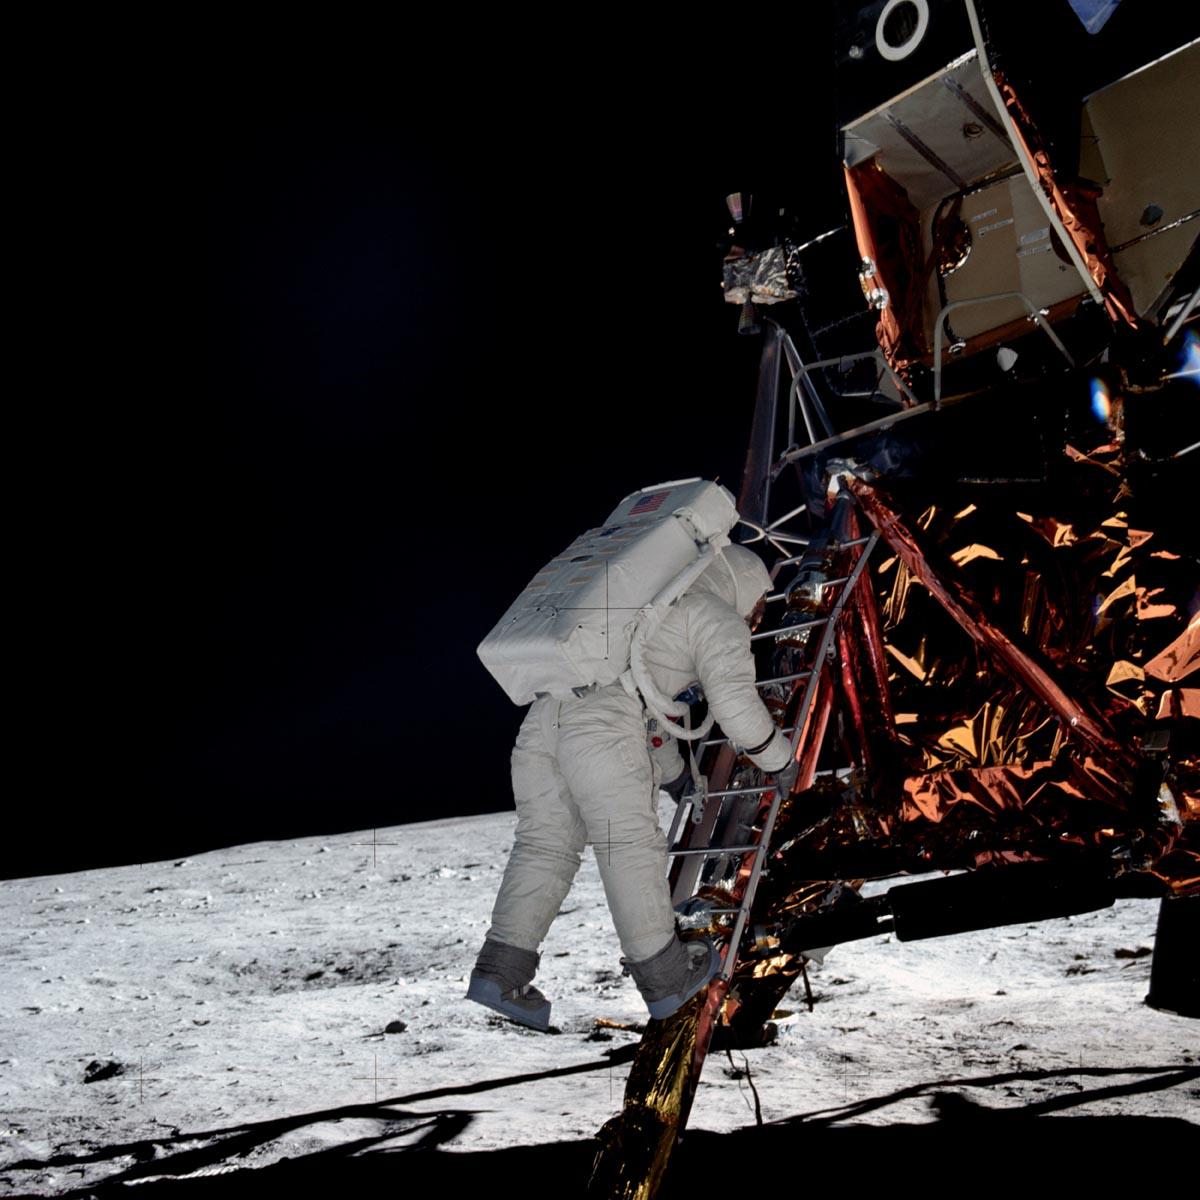 Moonwalk Archives - Apollospace